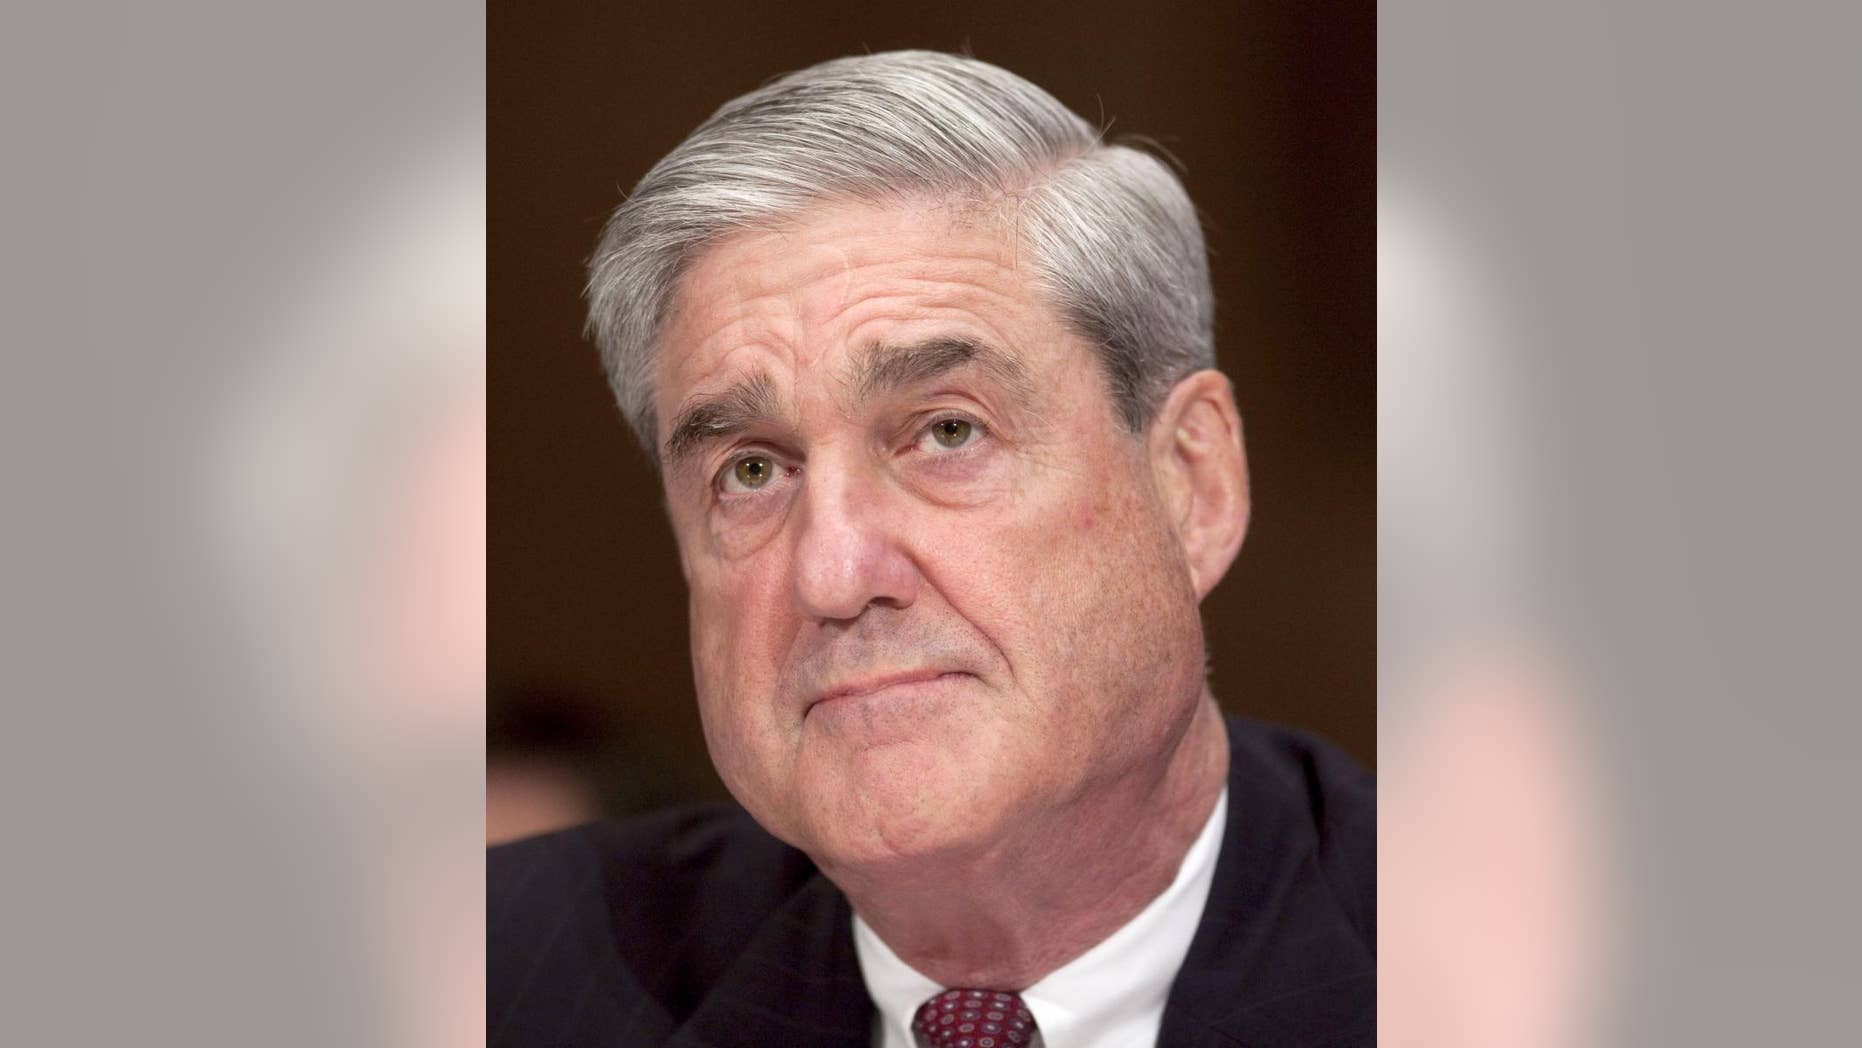 FBI Director Robert Mueller/AP image